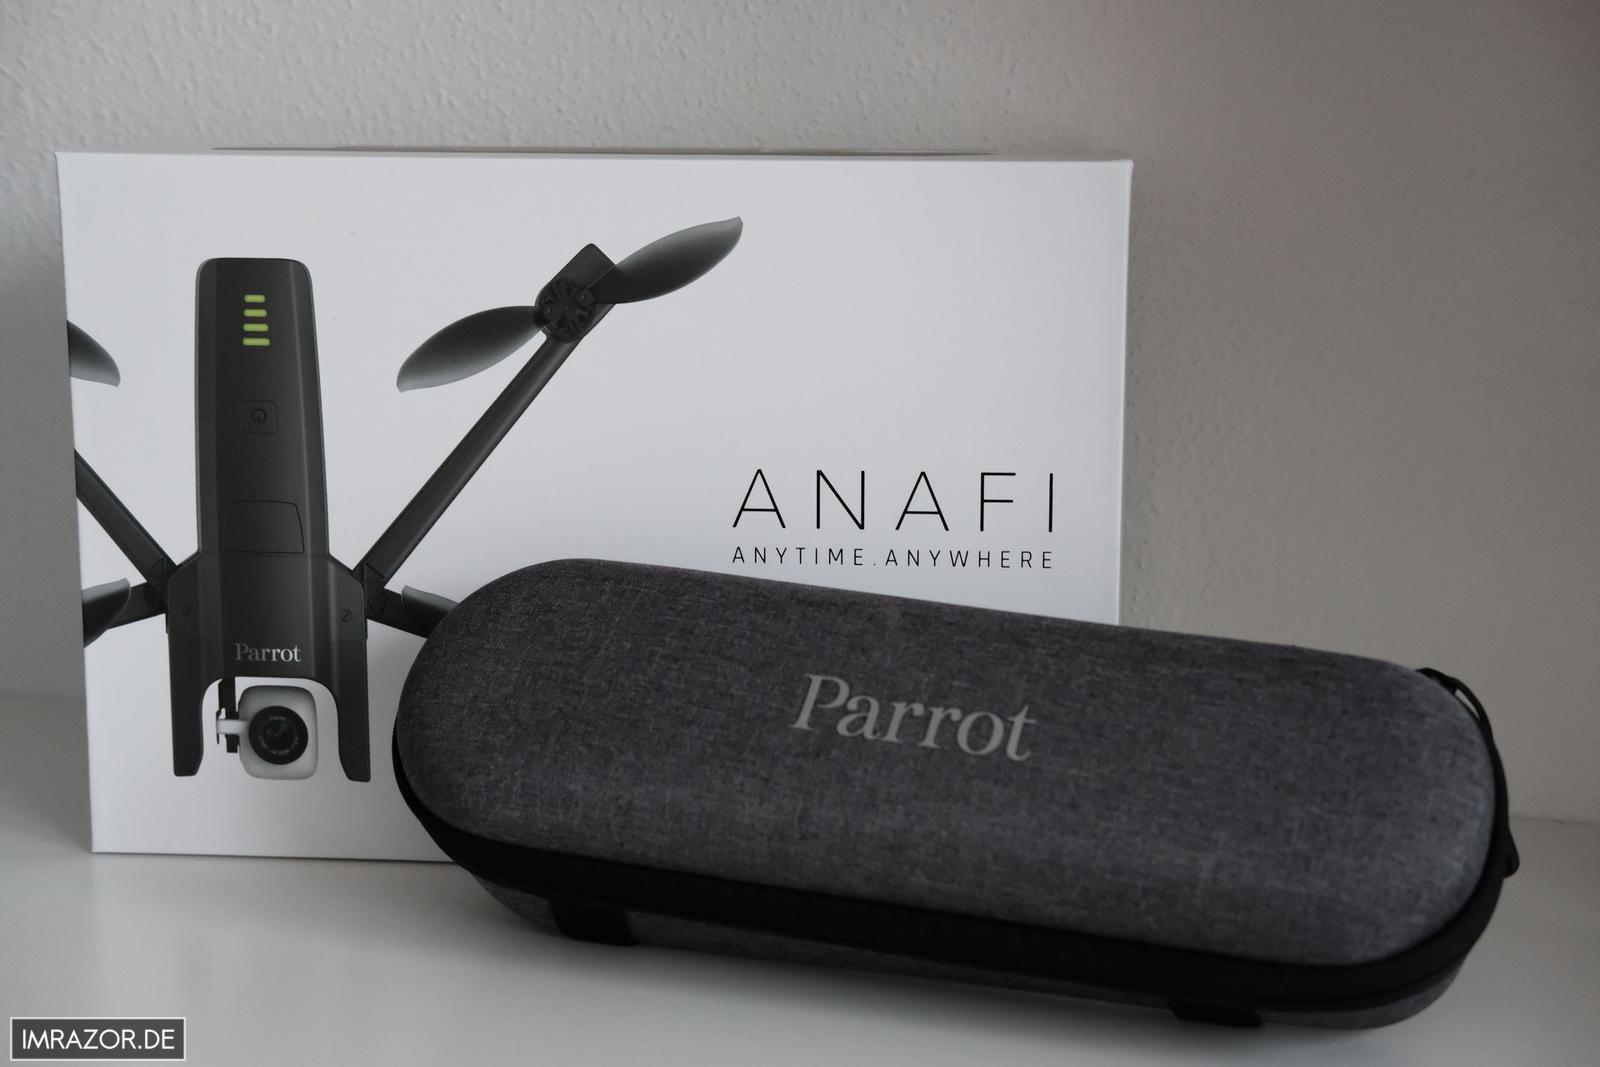 Review Parrot Anafi | Imrazor de